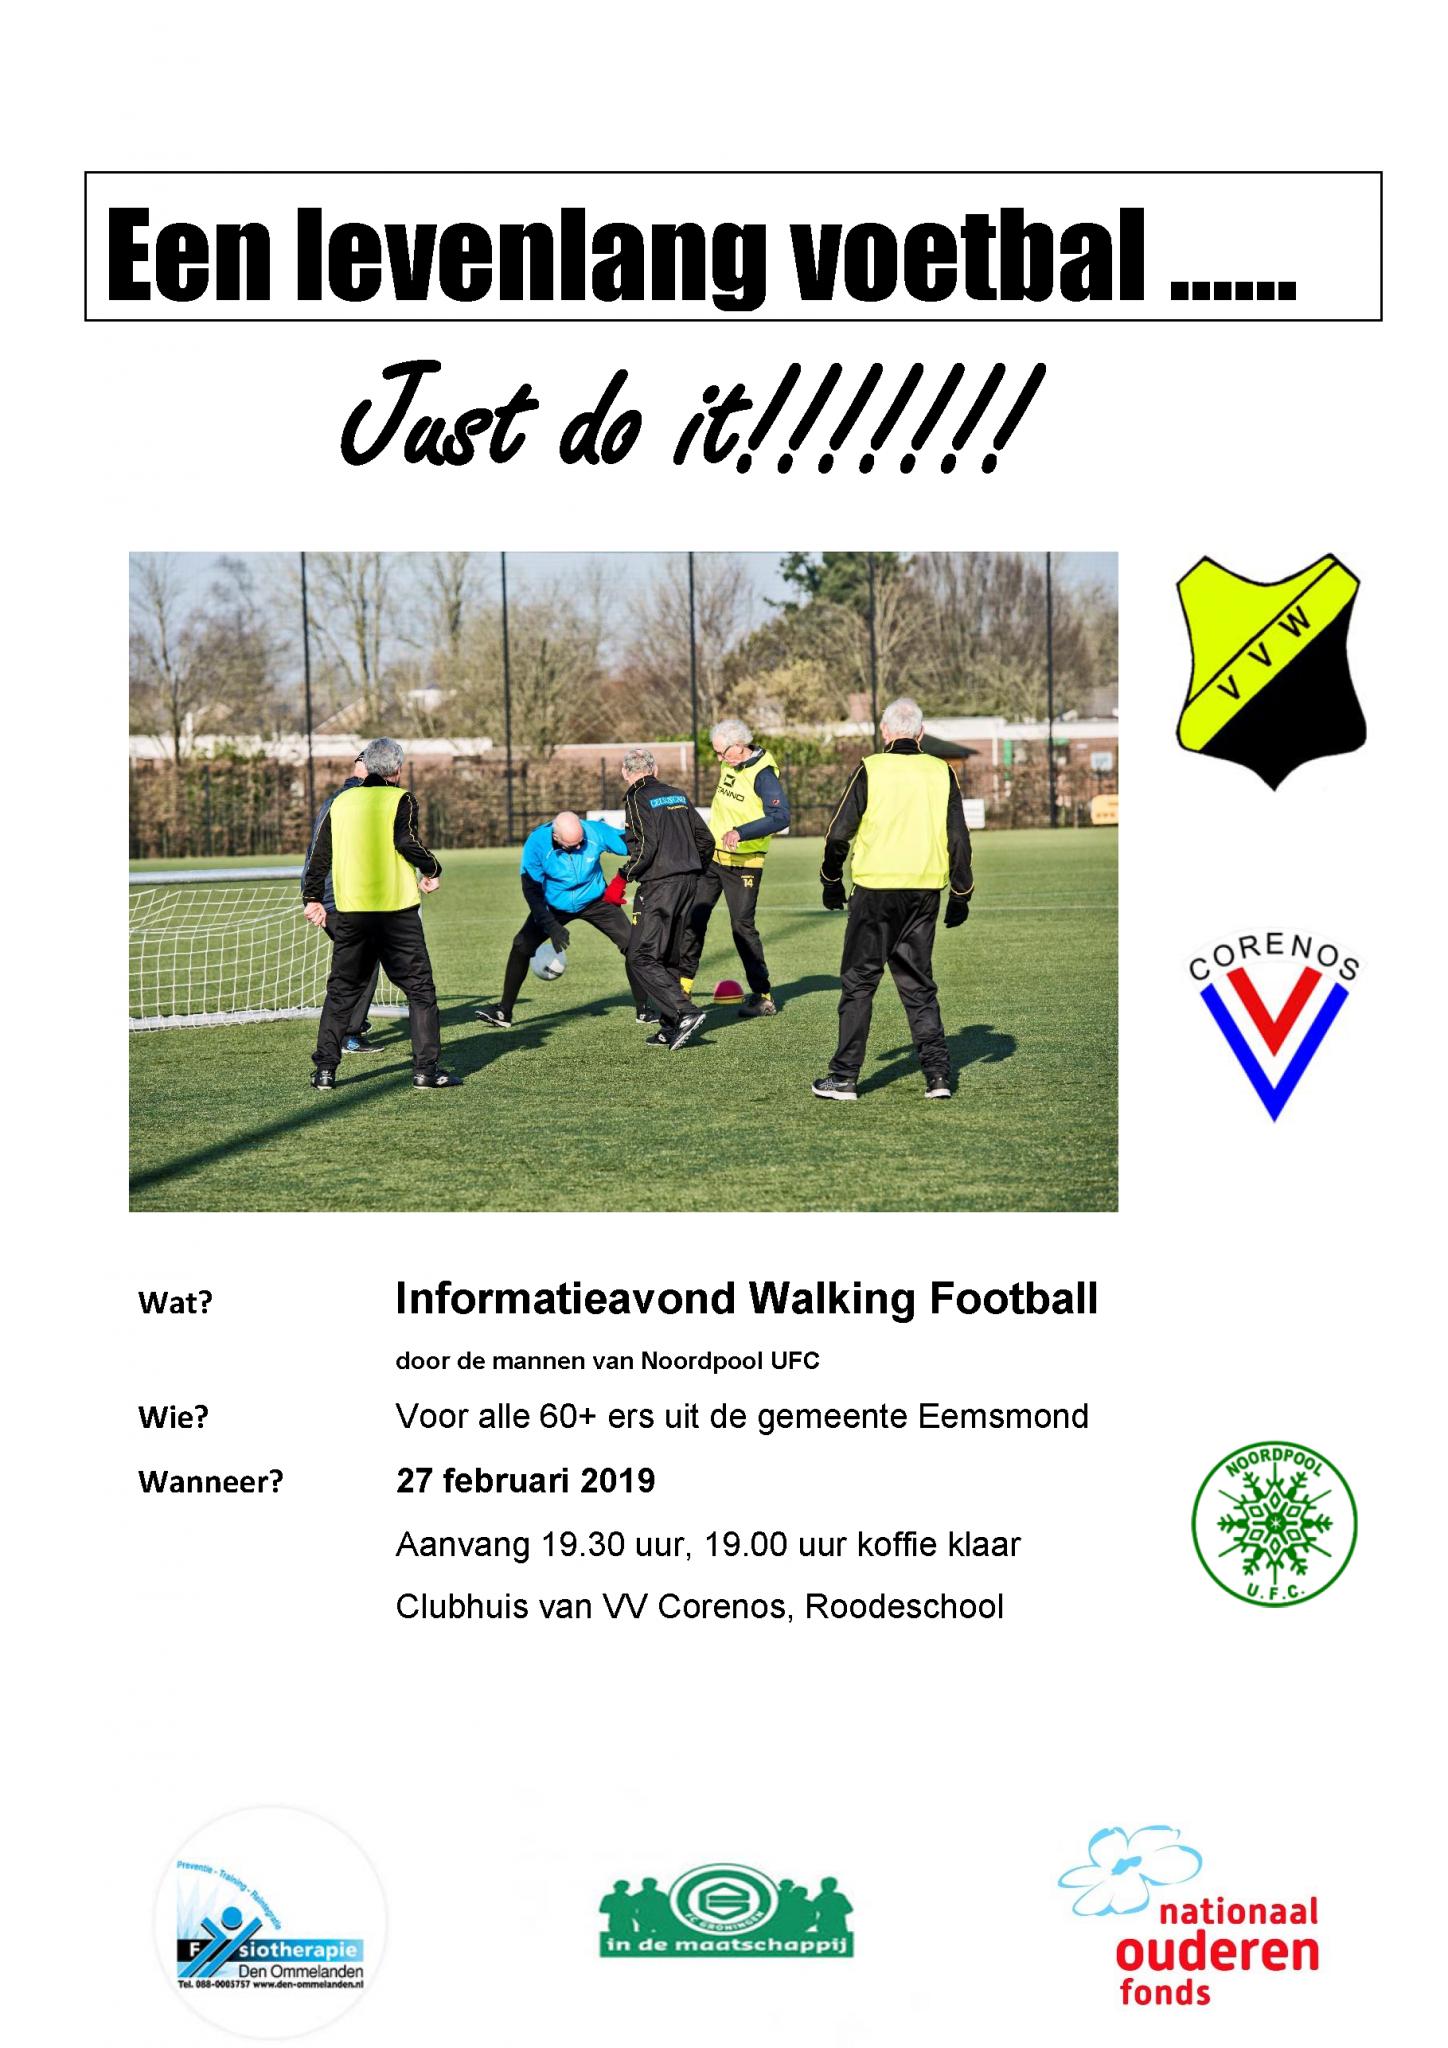 Informatieavond Walking Football